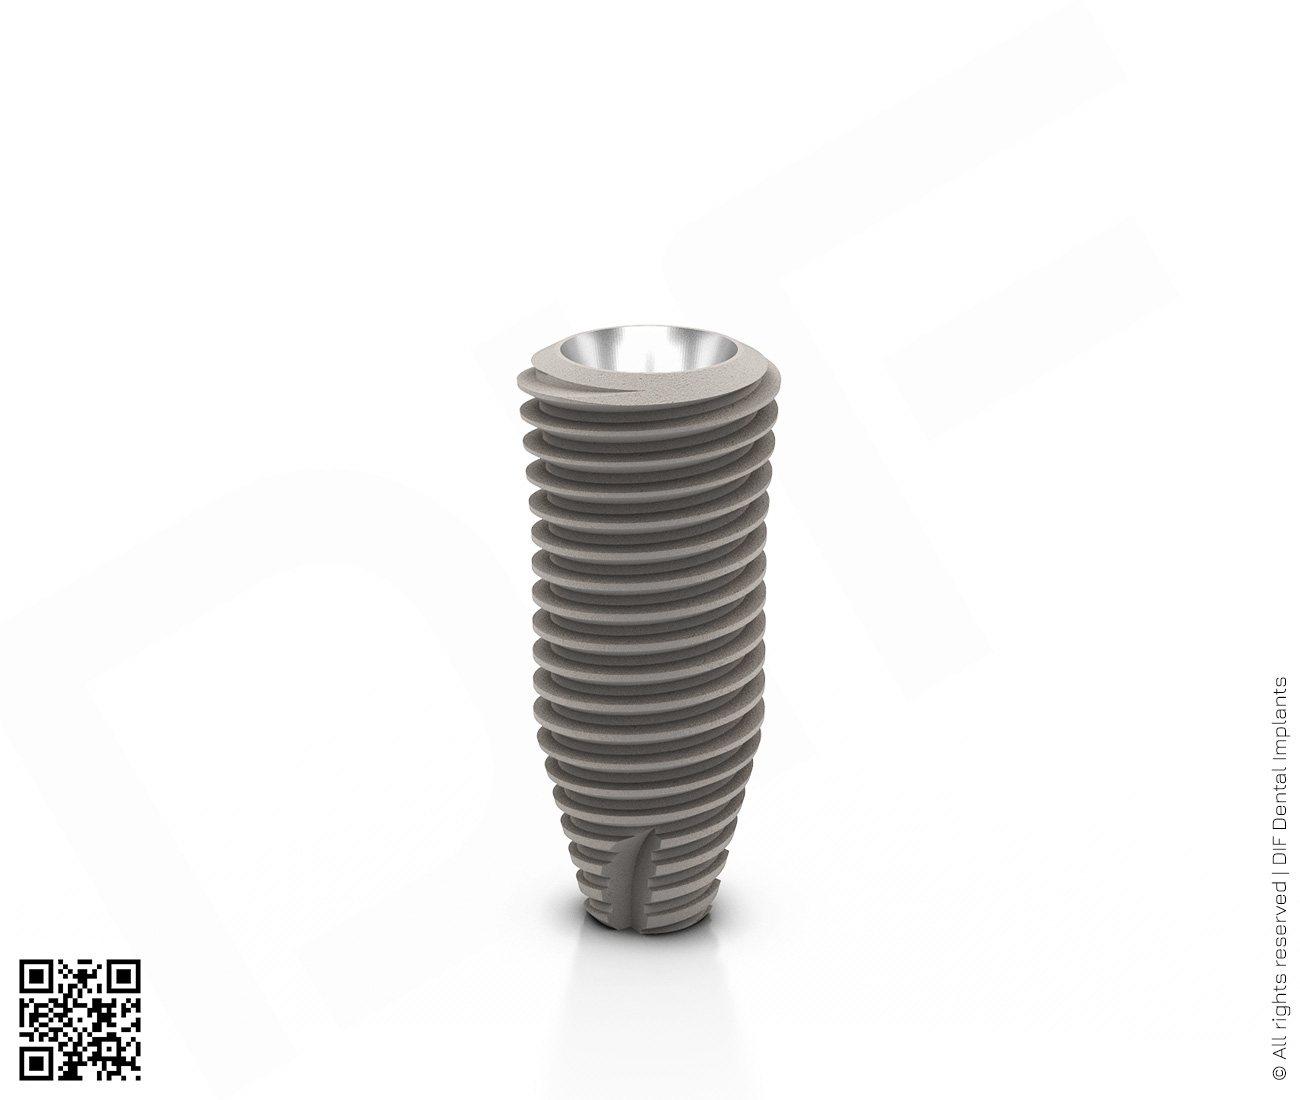 Фото имплантат mainstream fine d5.0 мм – l11.5 мм  производства DIF.